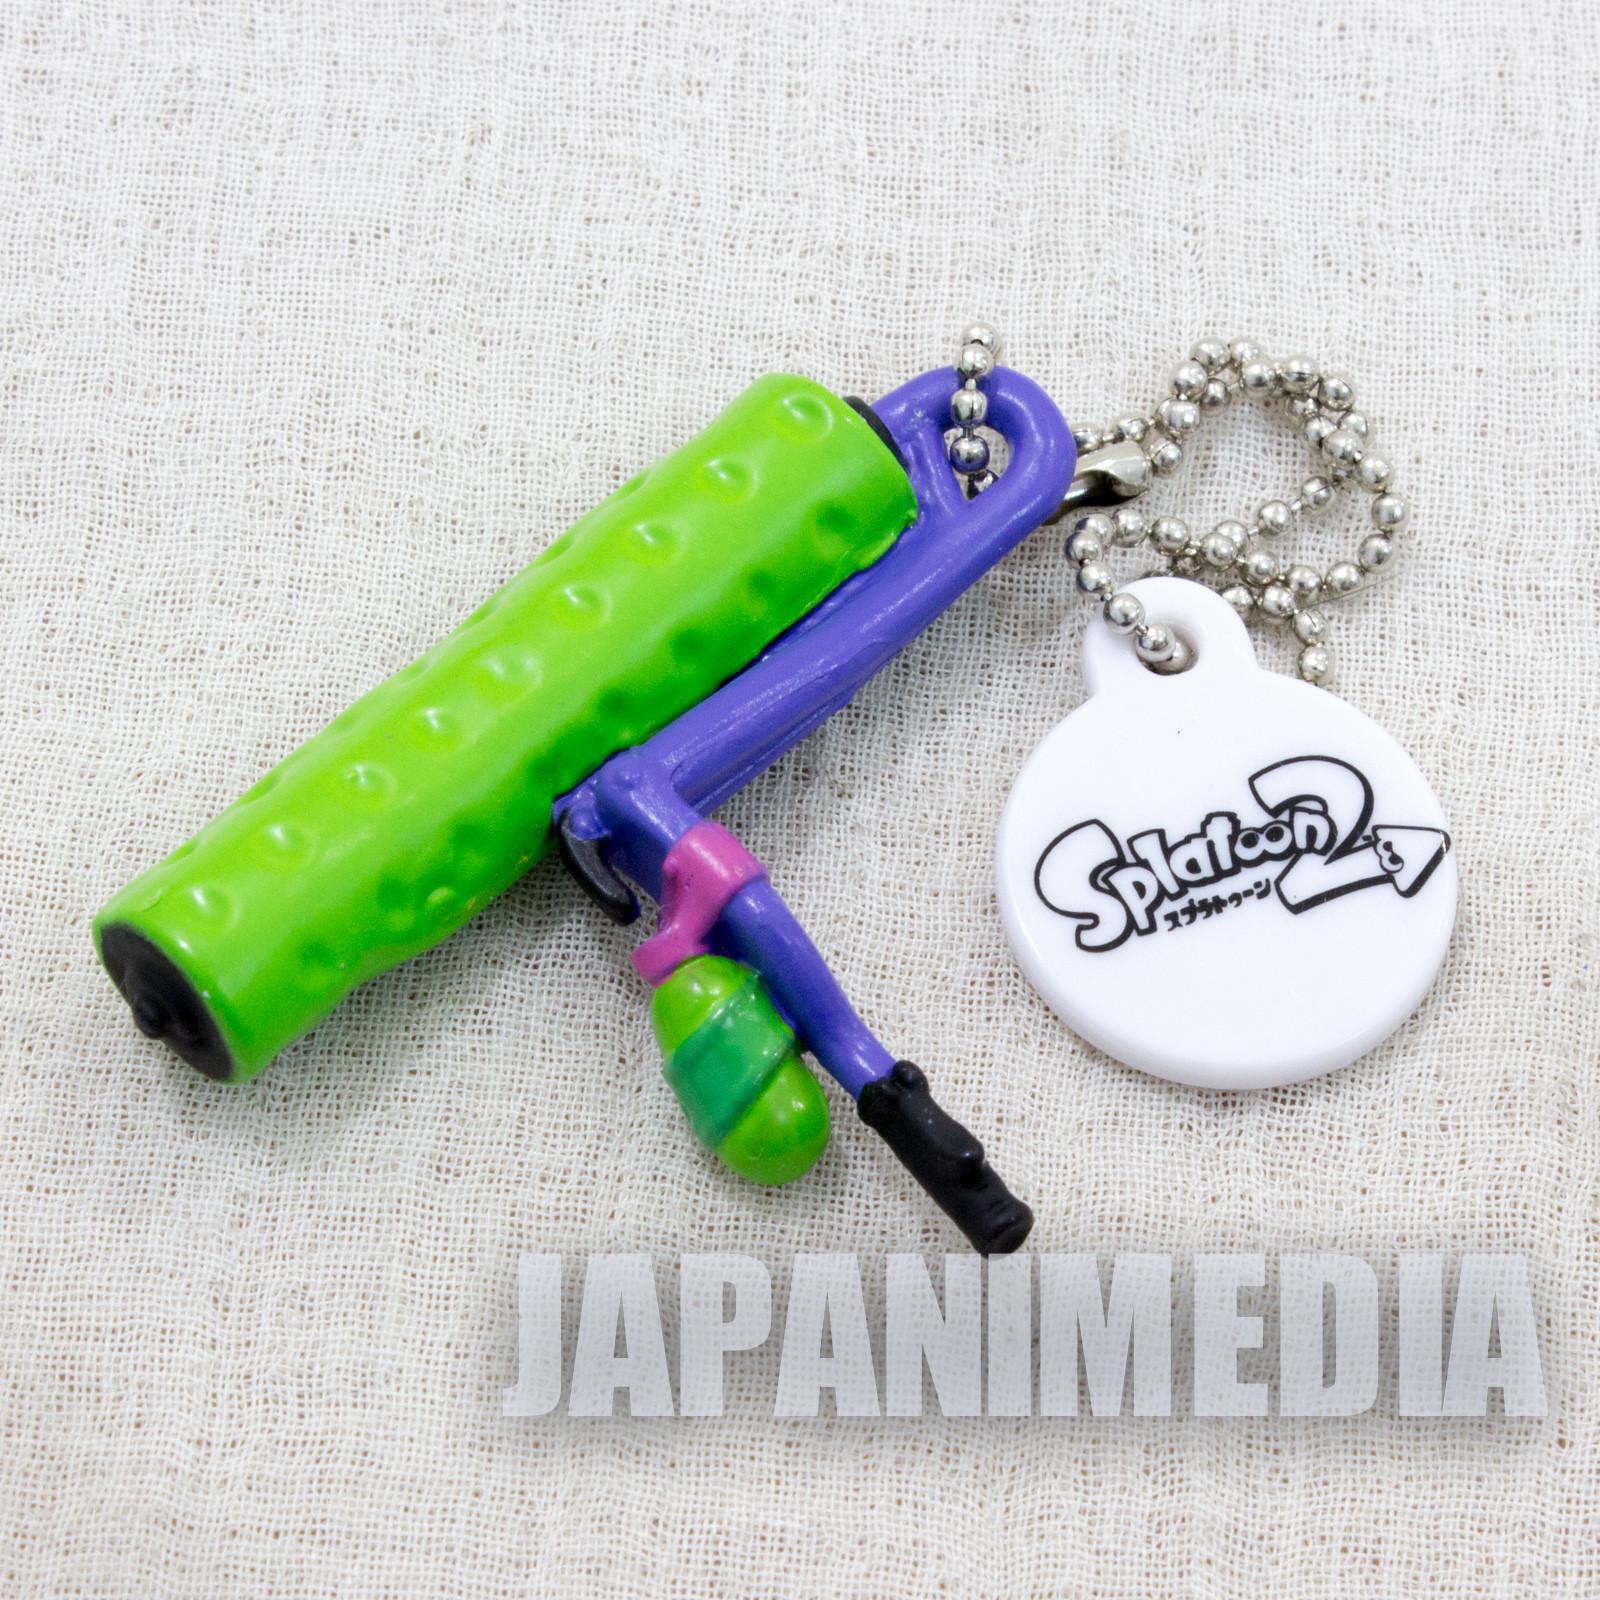 Splatoon 2 Weapon Figure Ballchain Splat Roller #2 Takara Tomy Nintendo Switch